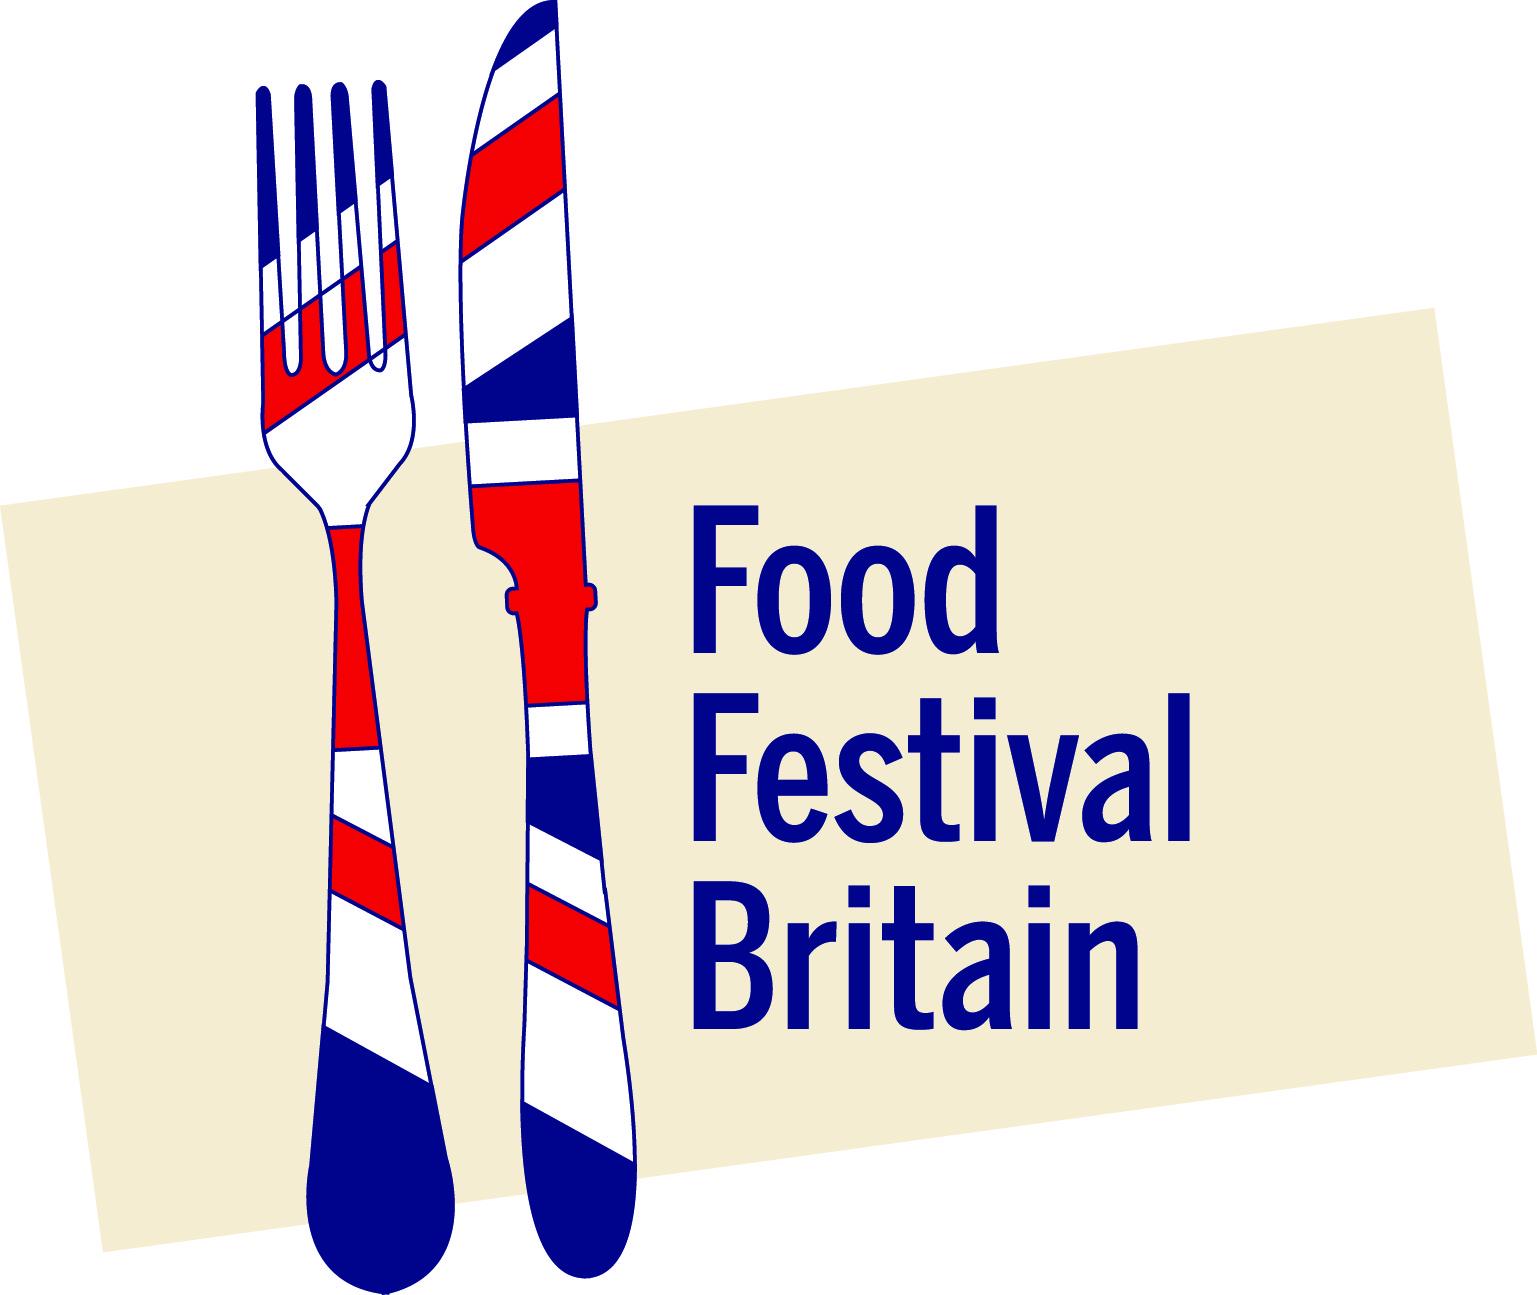 Festival clipart international trade Festivals Market will Food Square